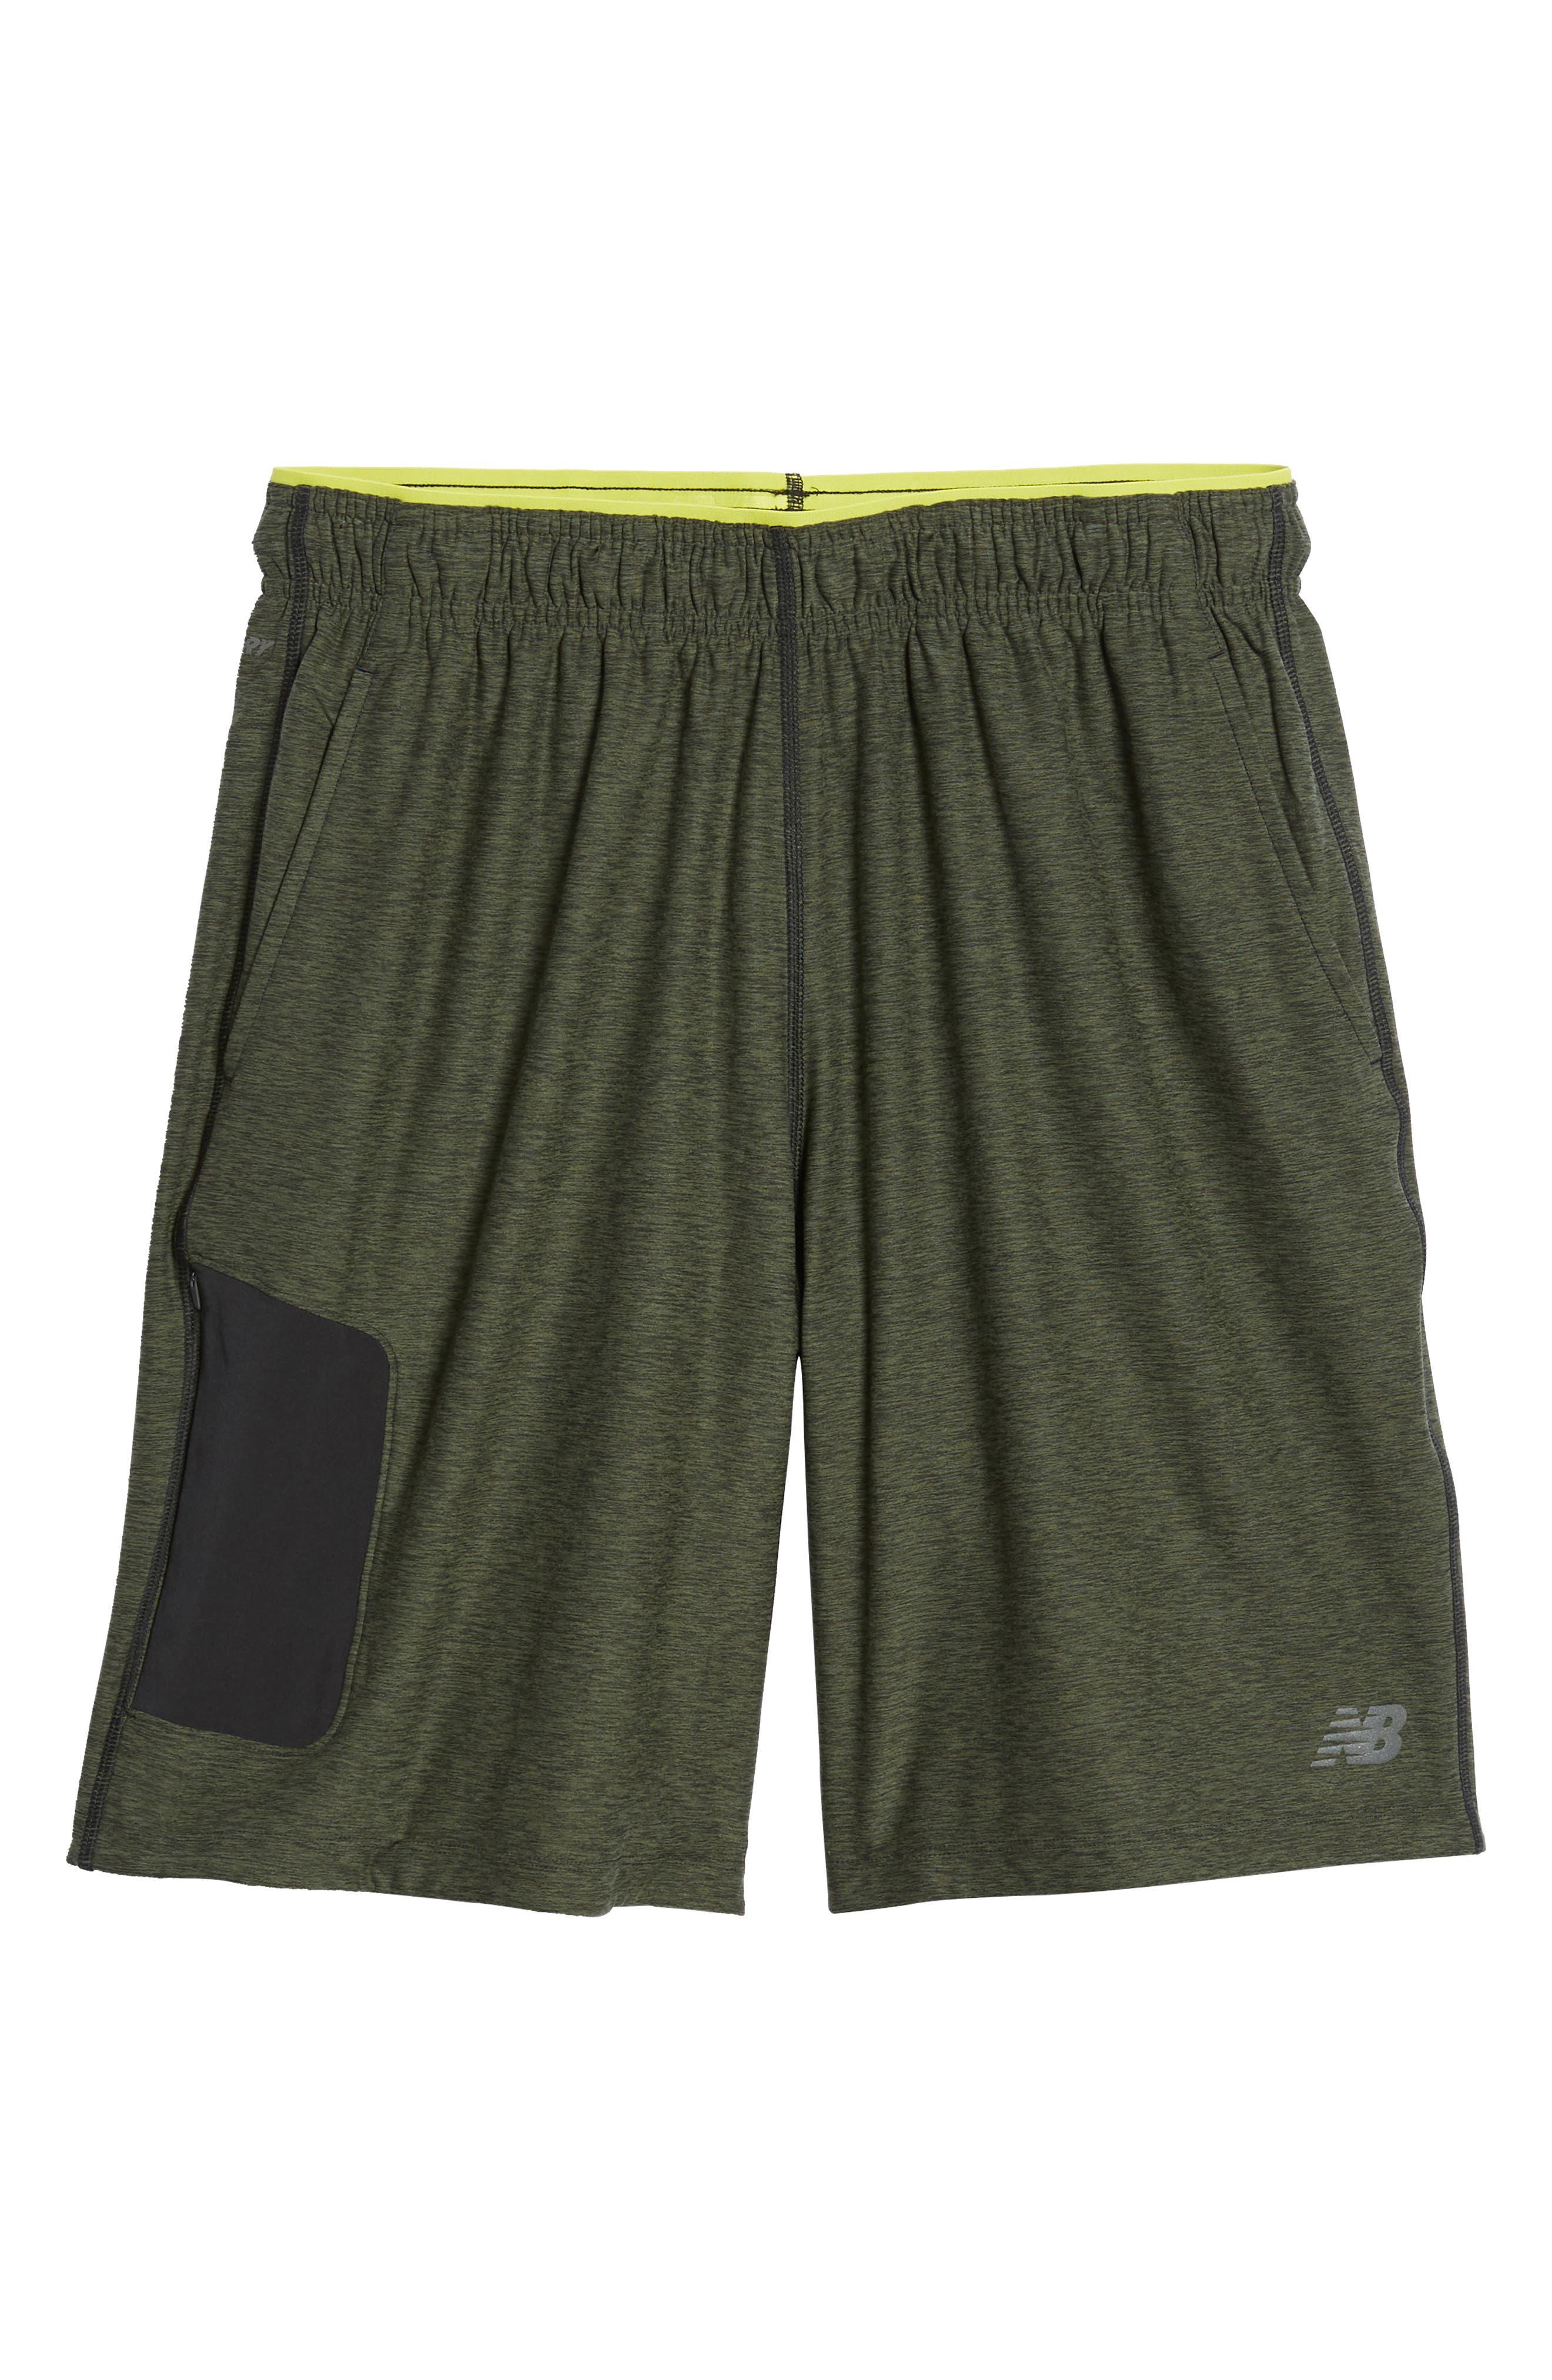 Anticipate Shorts,                             Alternate thumbnail 6, color,                             Dark Covert Green